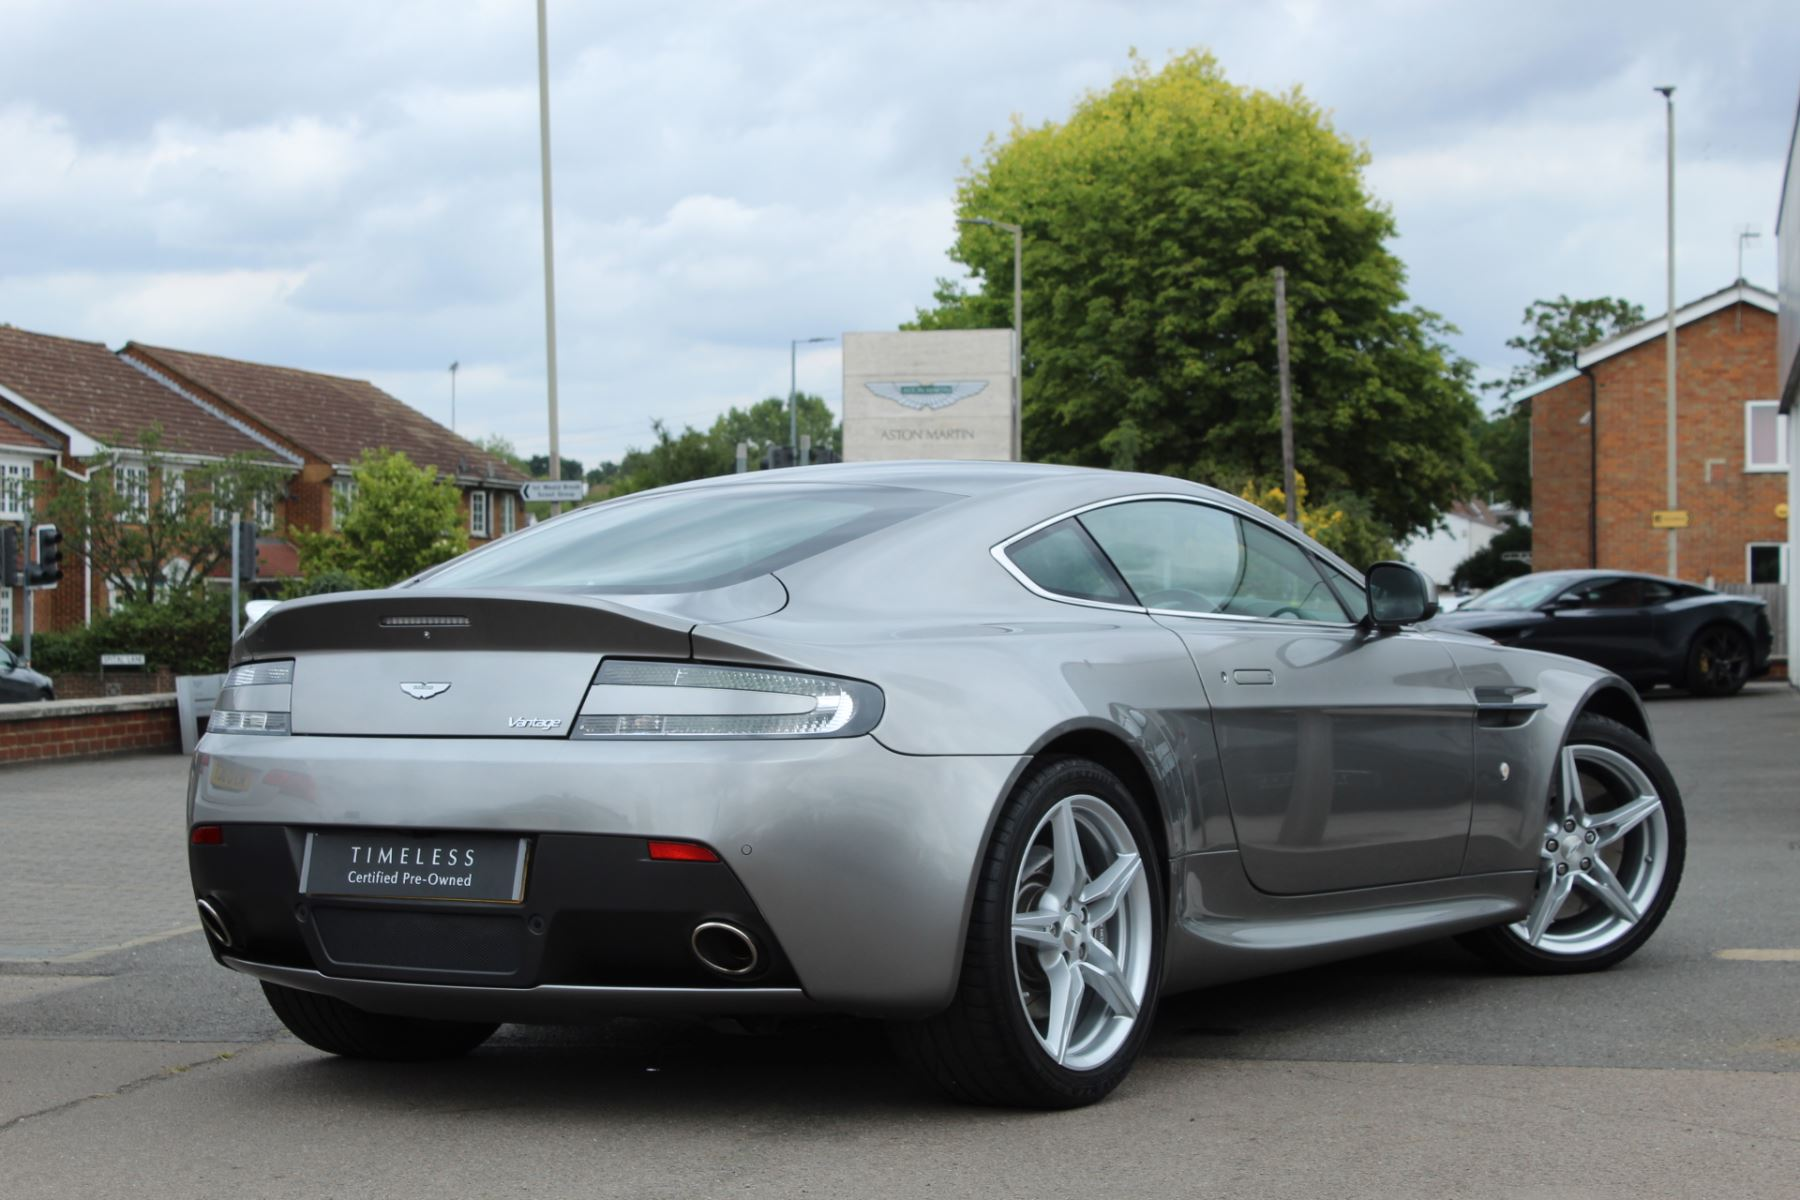 Aston Martin V8 Vantage Coupe 2dr Sportshift [420] image 10